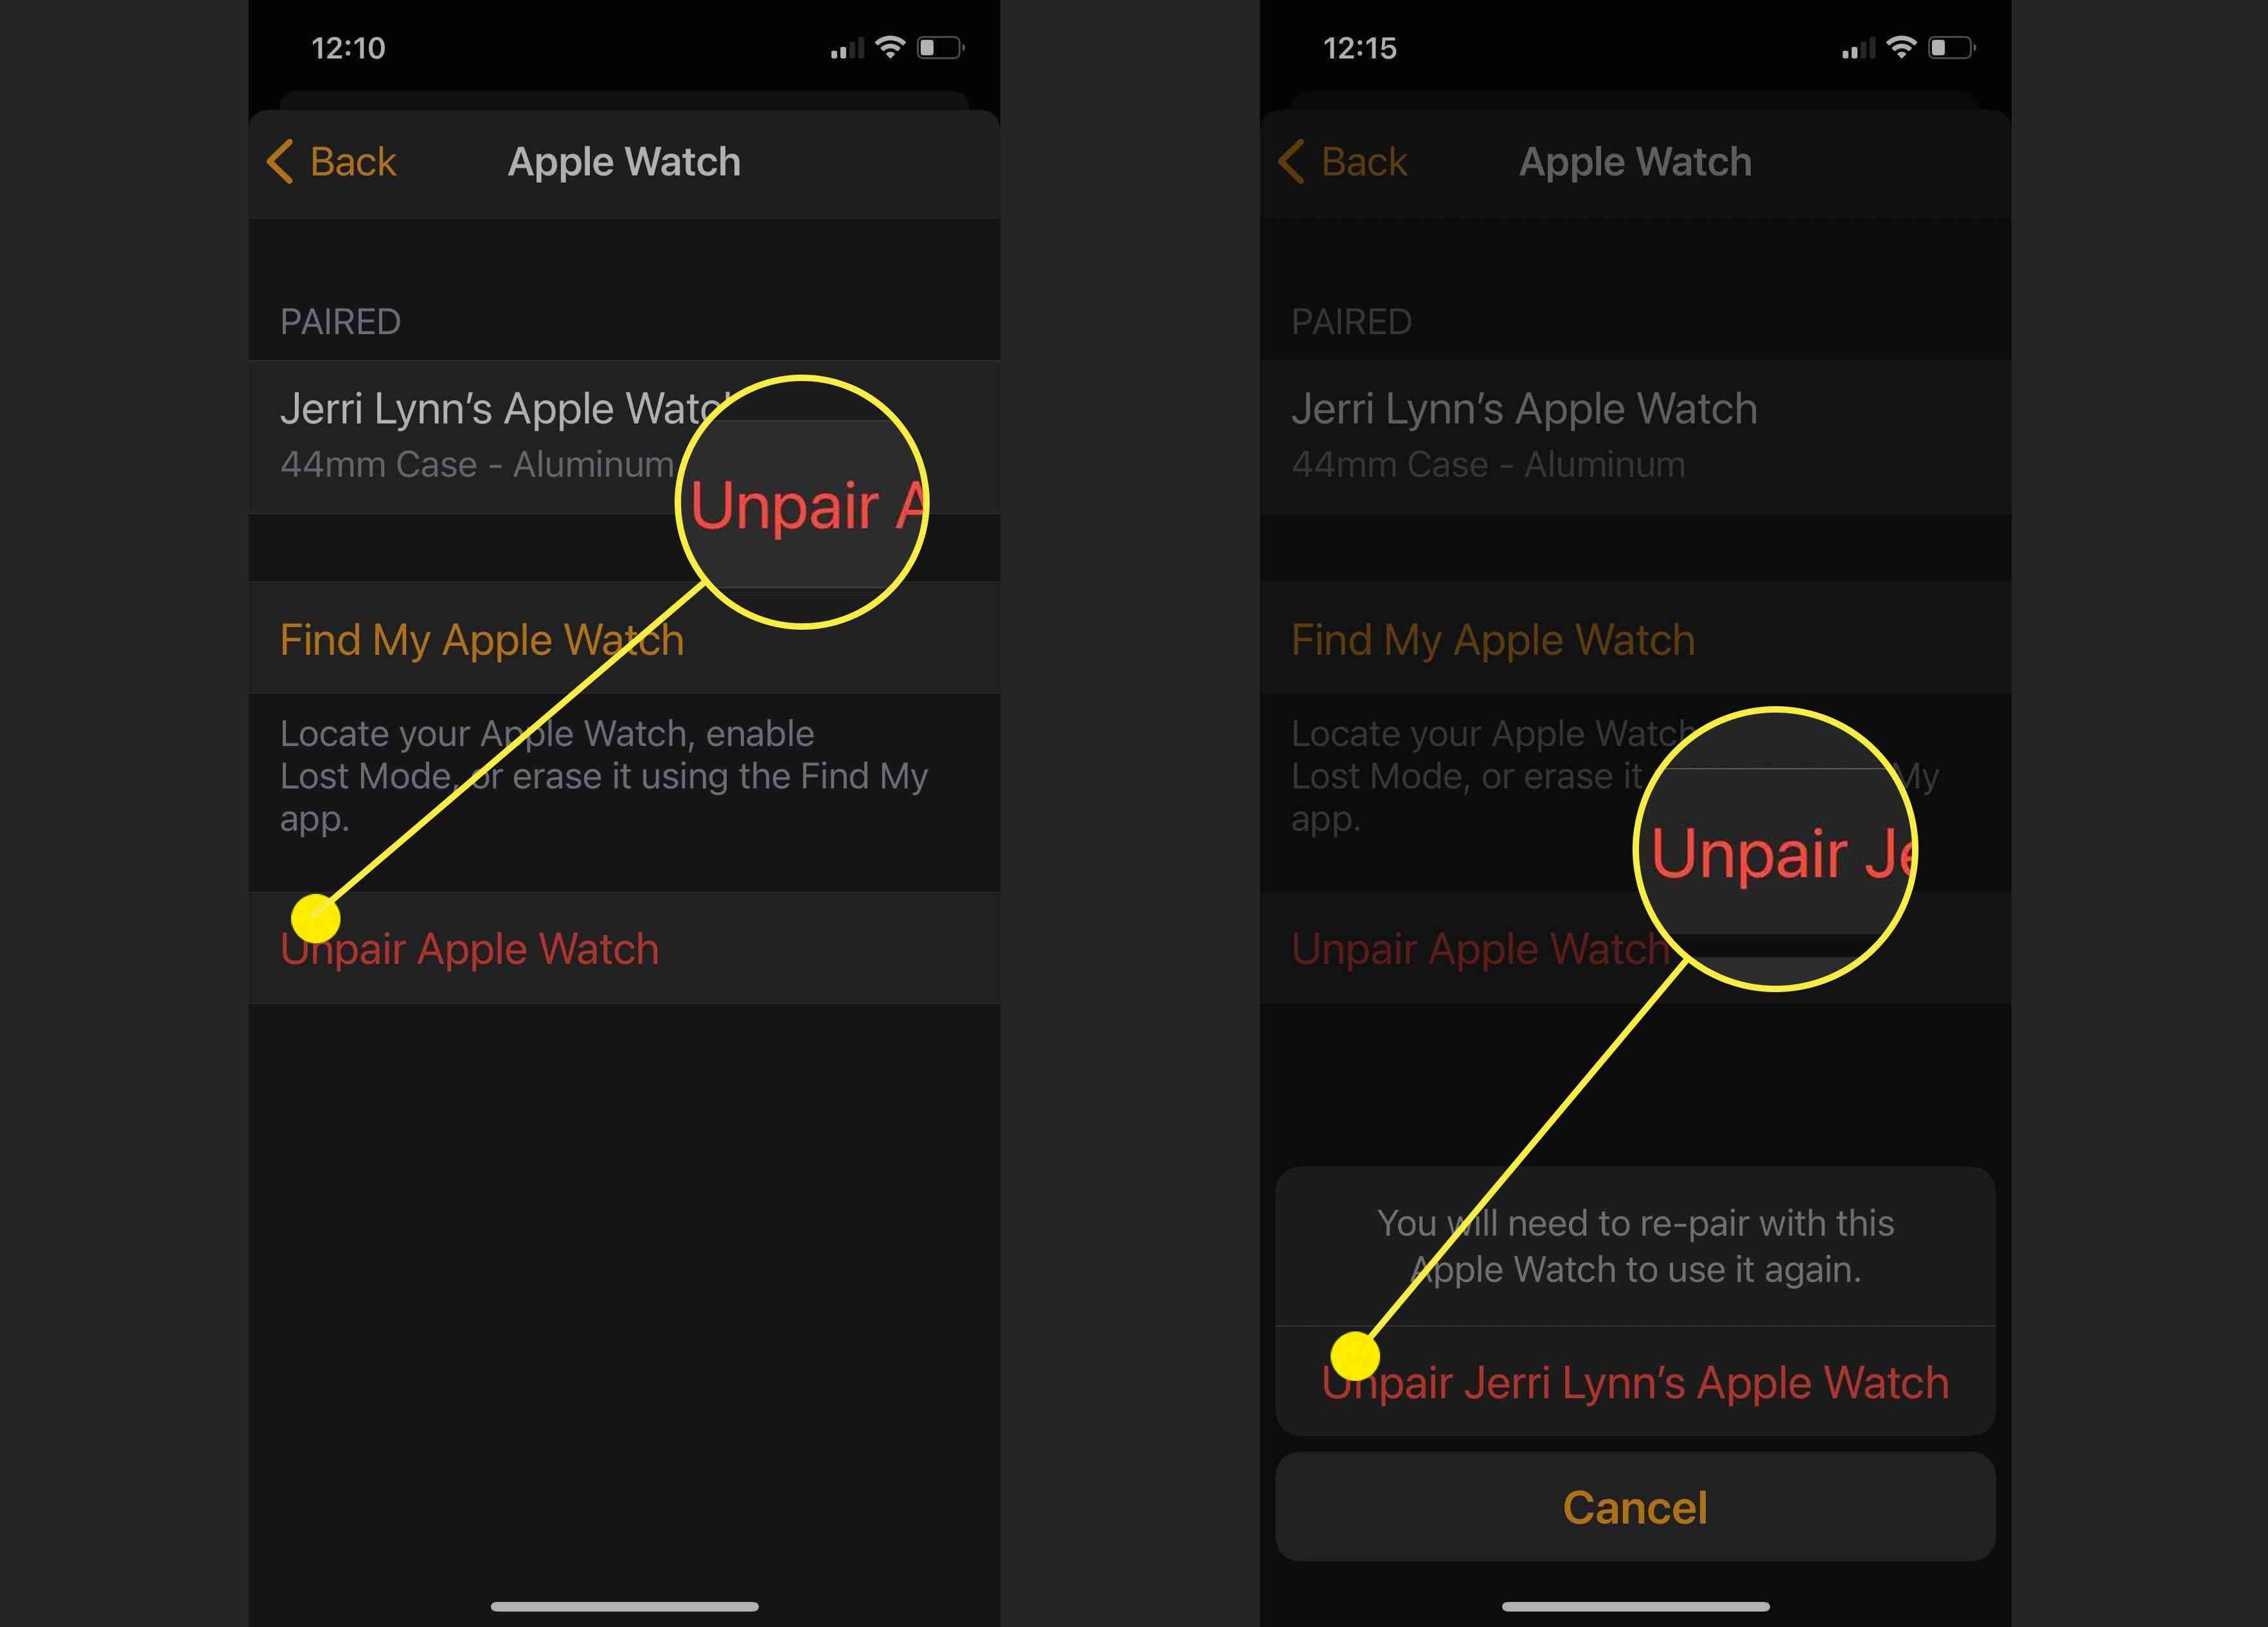 Screenshots showing how to Unpair an Apple Watch from an iPhone.